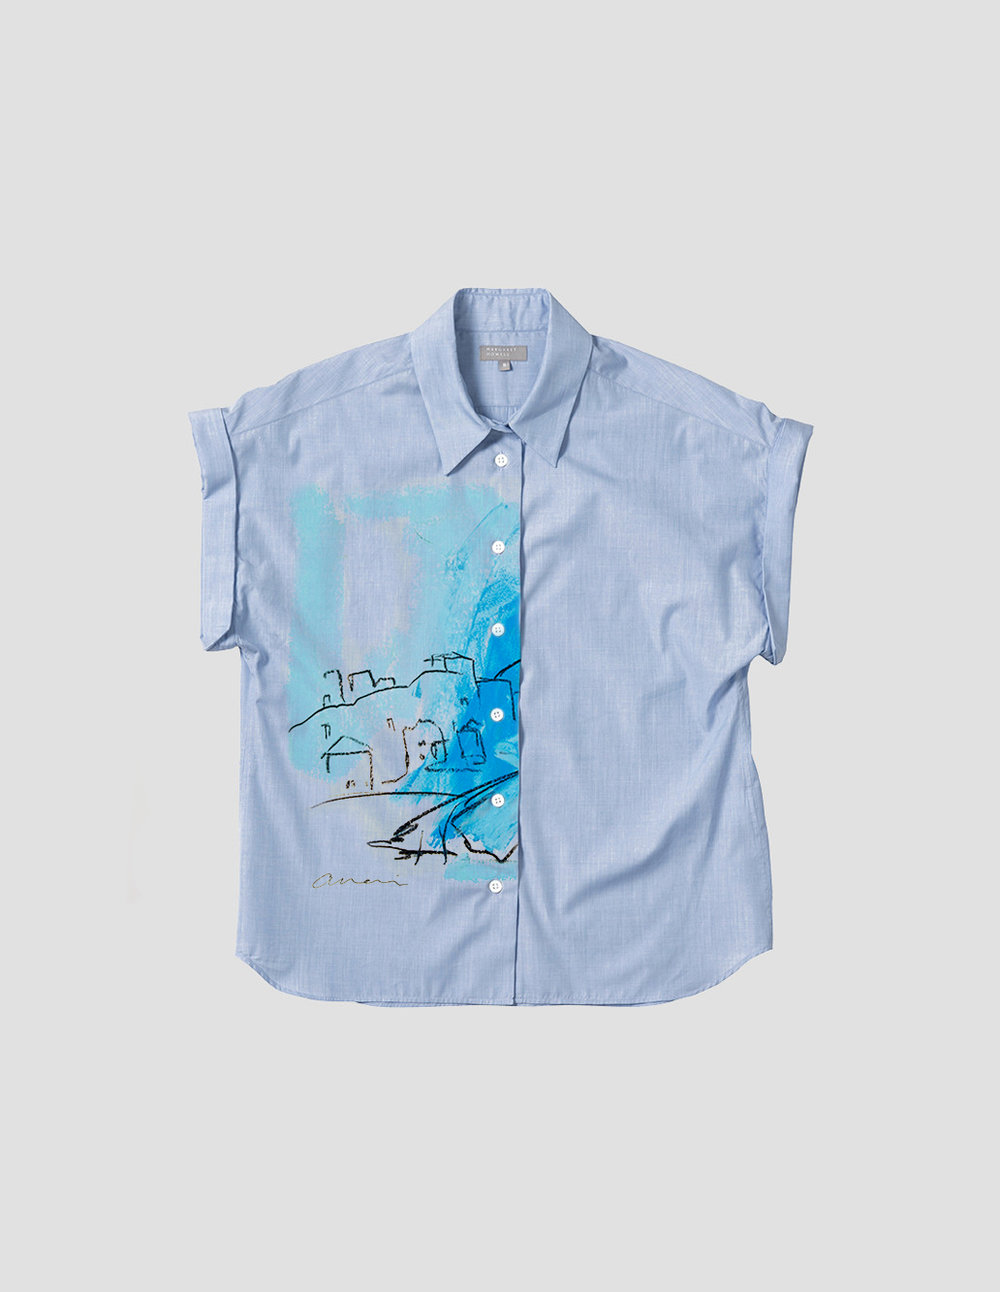 blue city_painted shirt copy.jpg